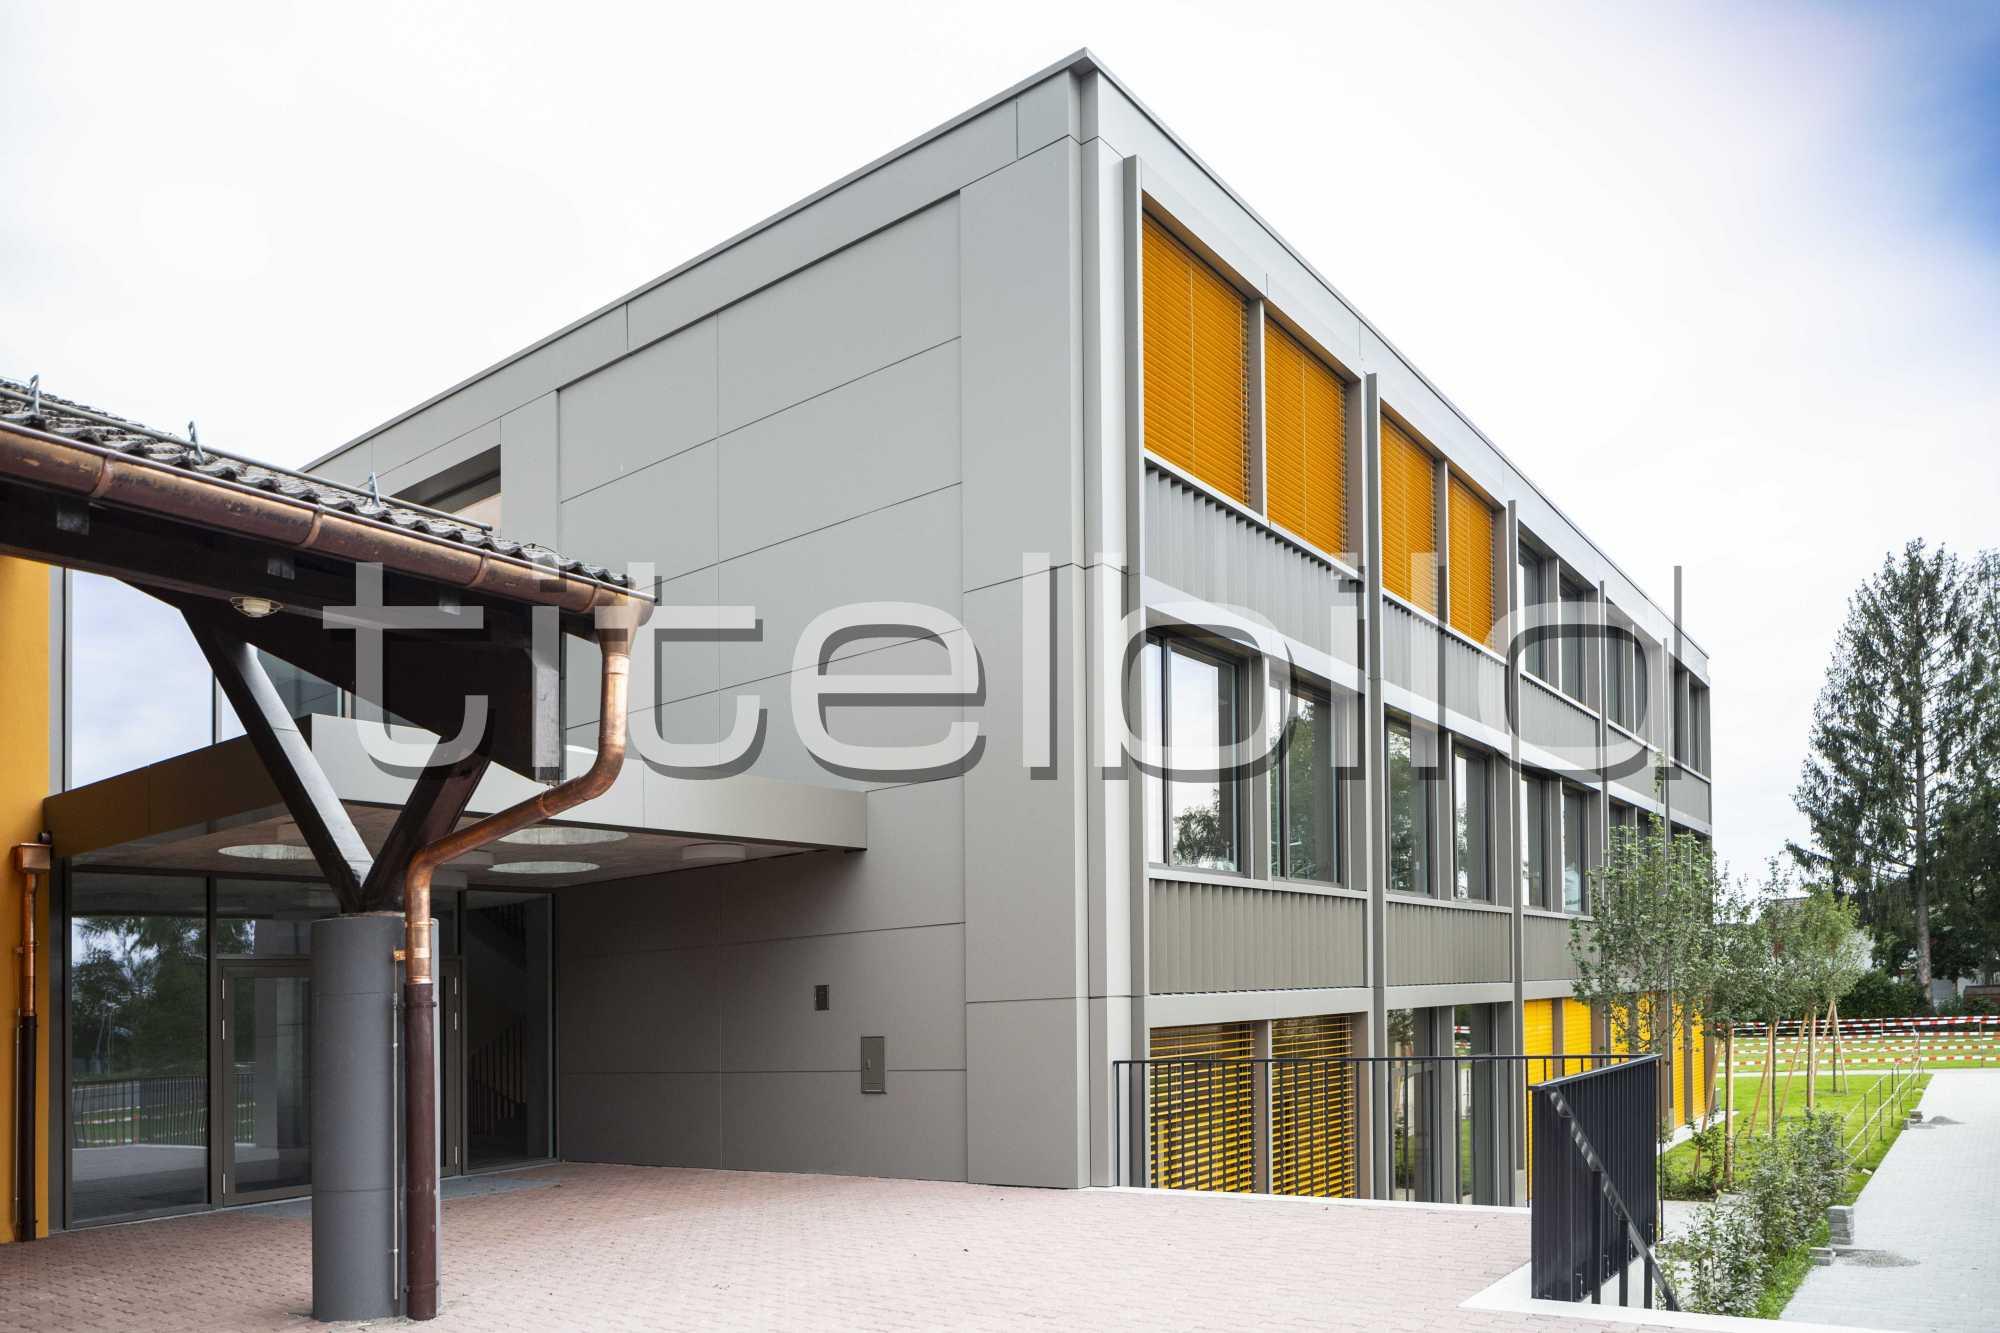 Projektbild-Nr. 2: Erweiterung Primarschule Oberglatt